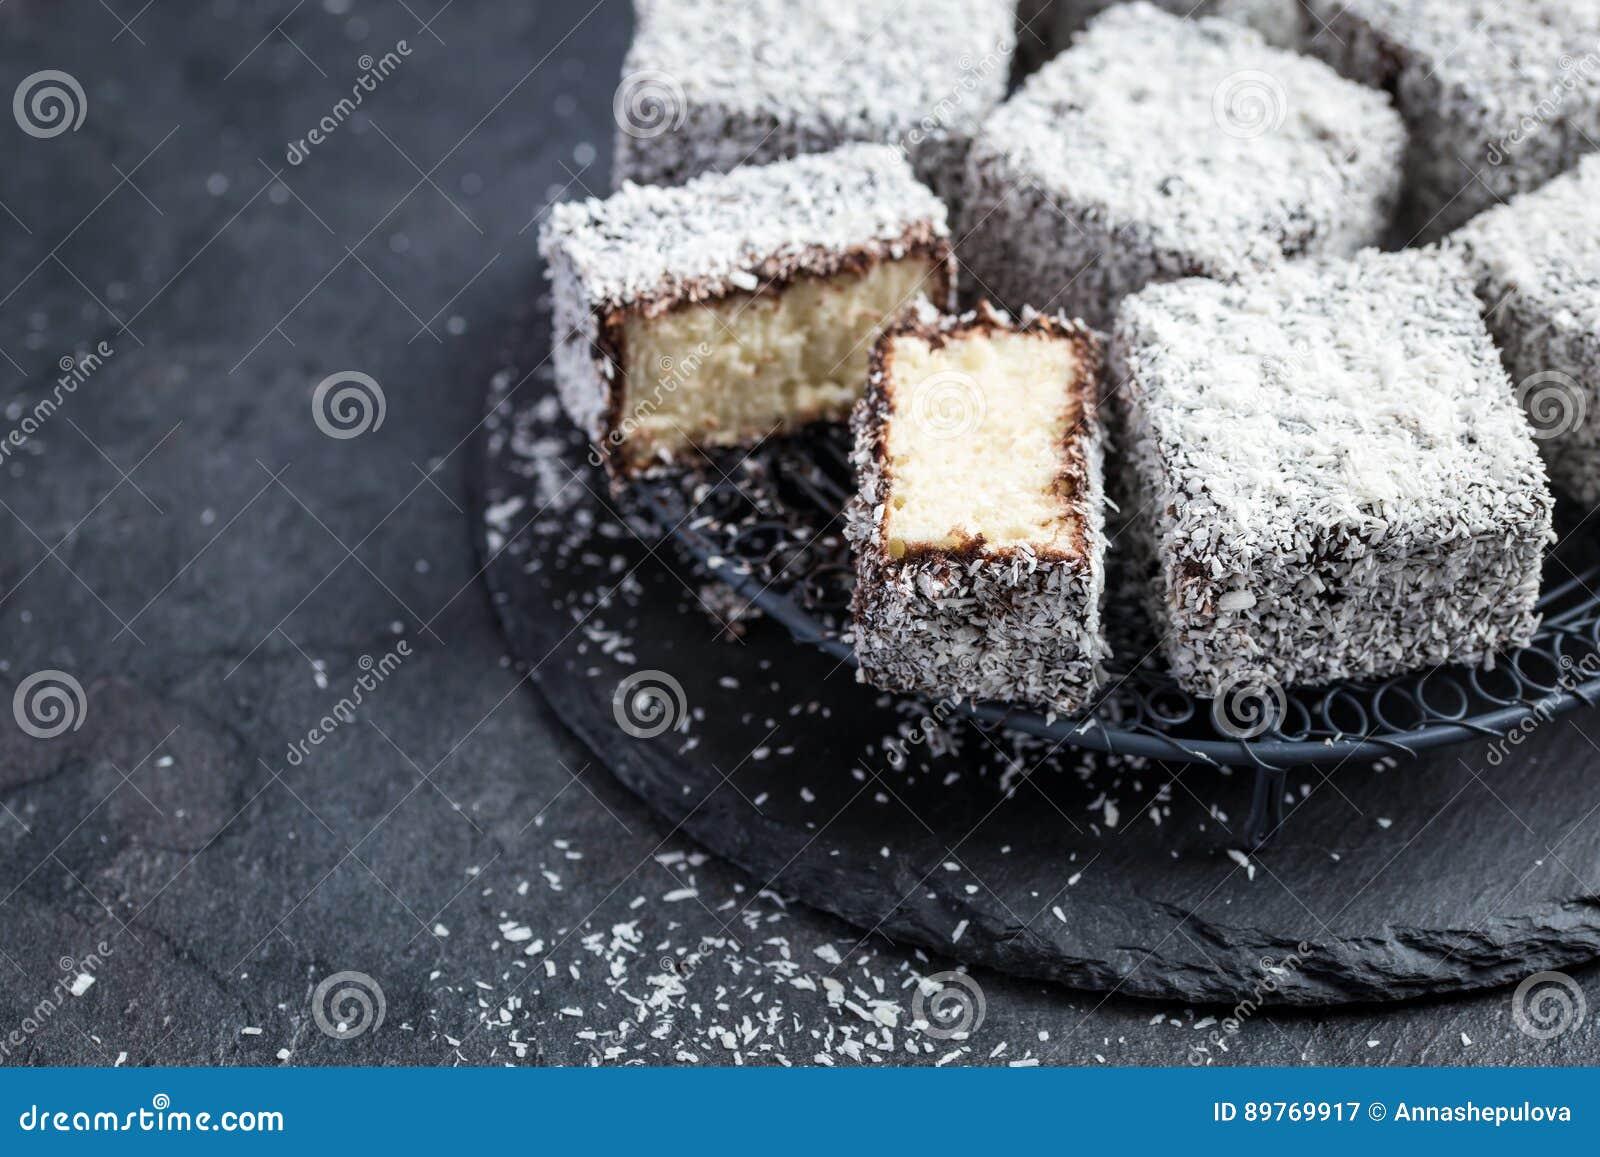 Easy Chocolate Cake Recipe Kidspot